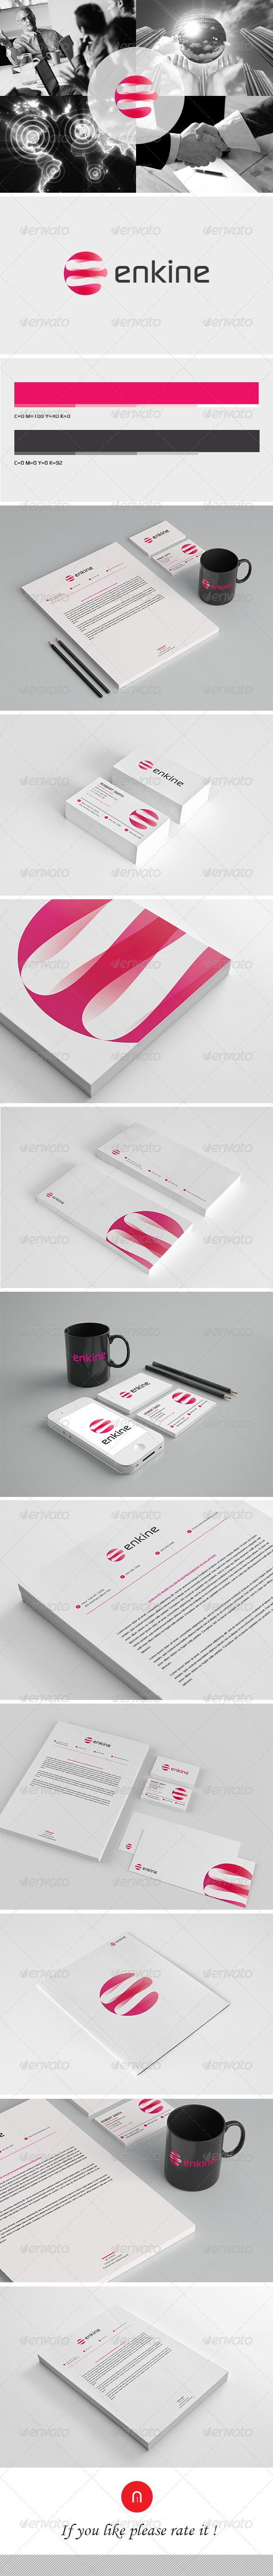 GraphicRiver Stationary & Brand Identity Enkine 3531699